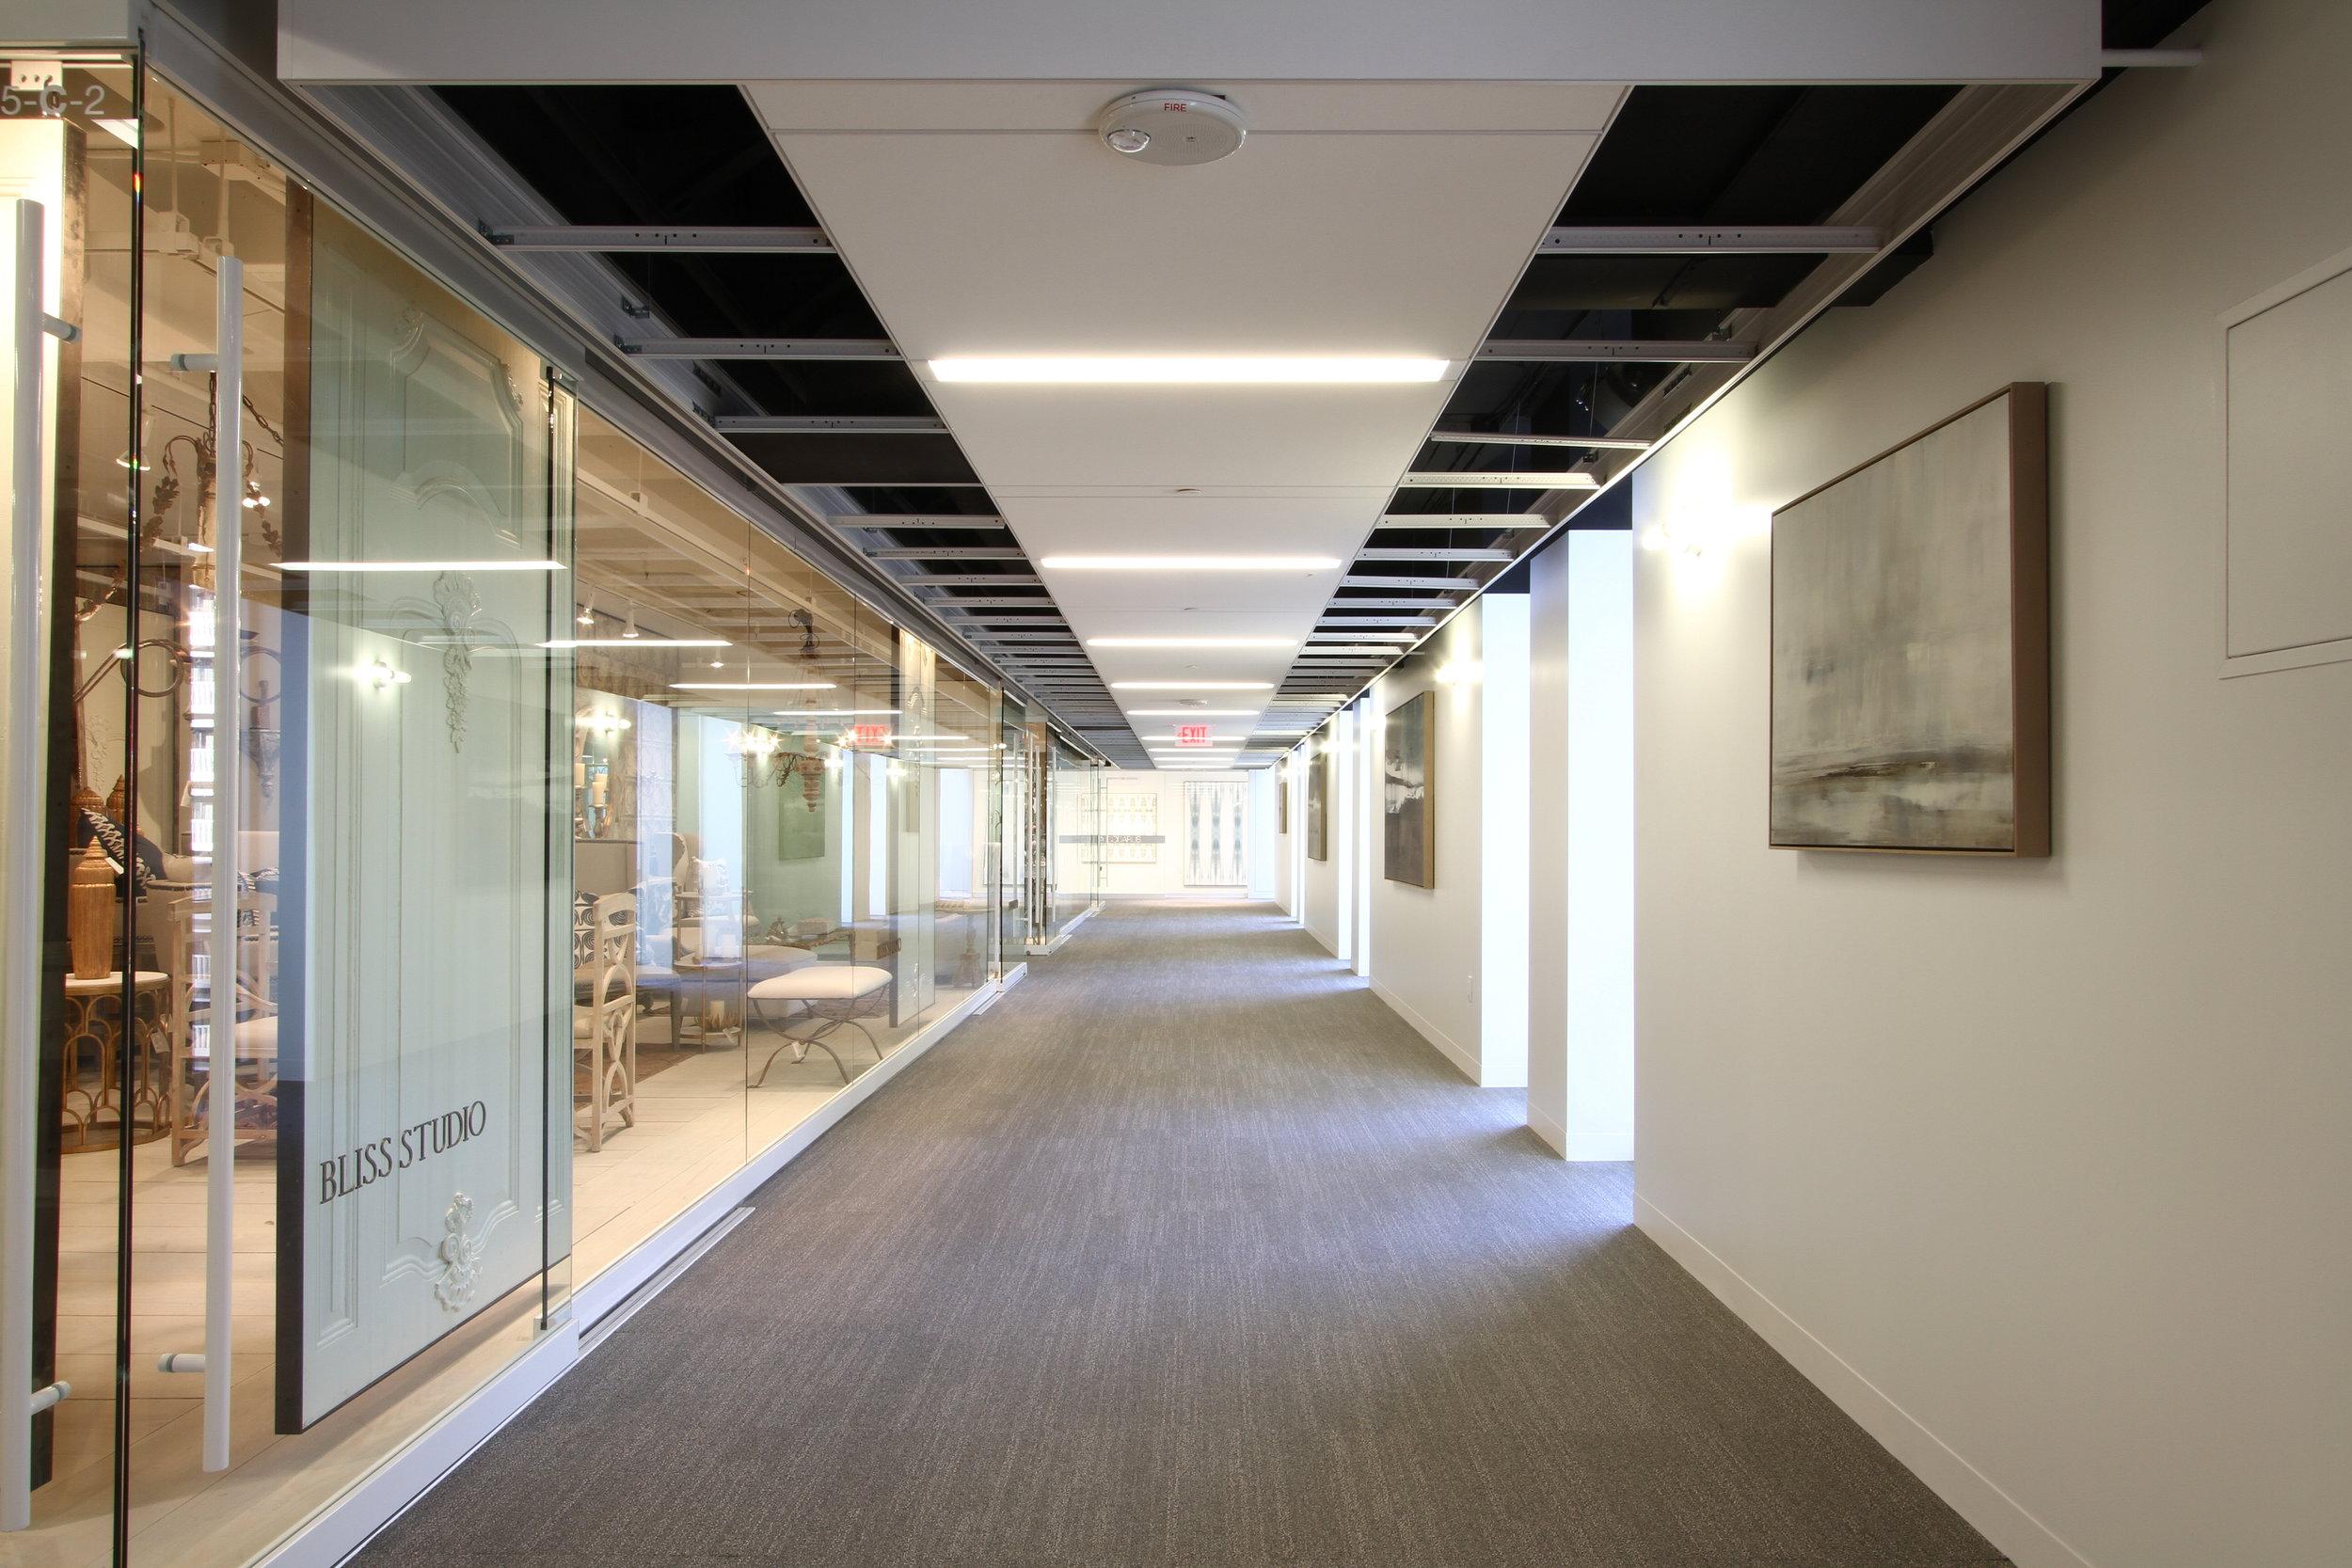 2015 AGC Merit Award - America's Mart, Bldg 1, 15th Floor-